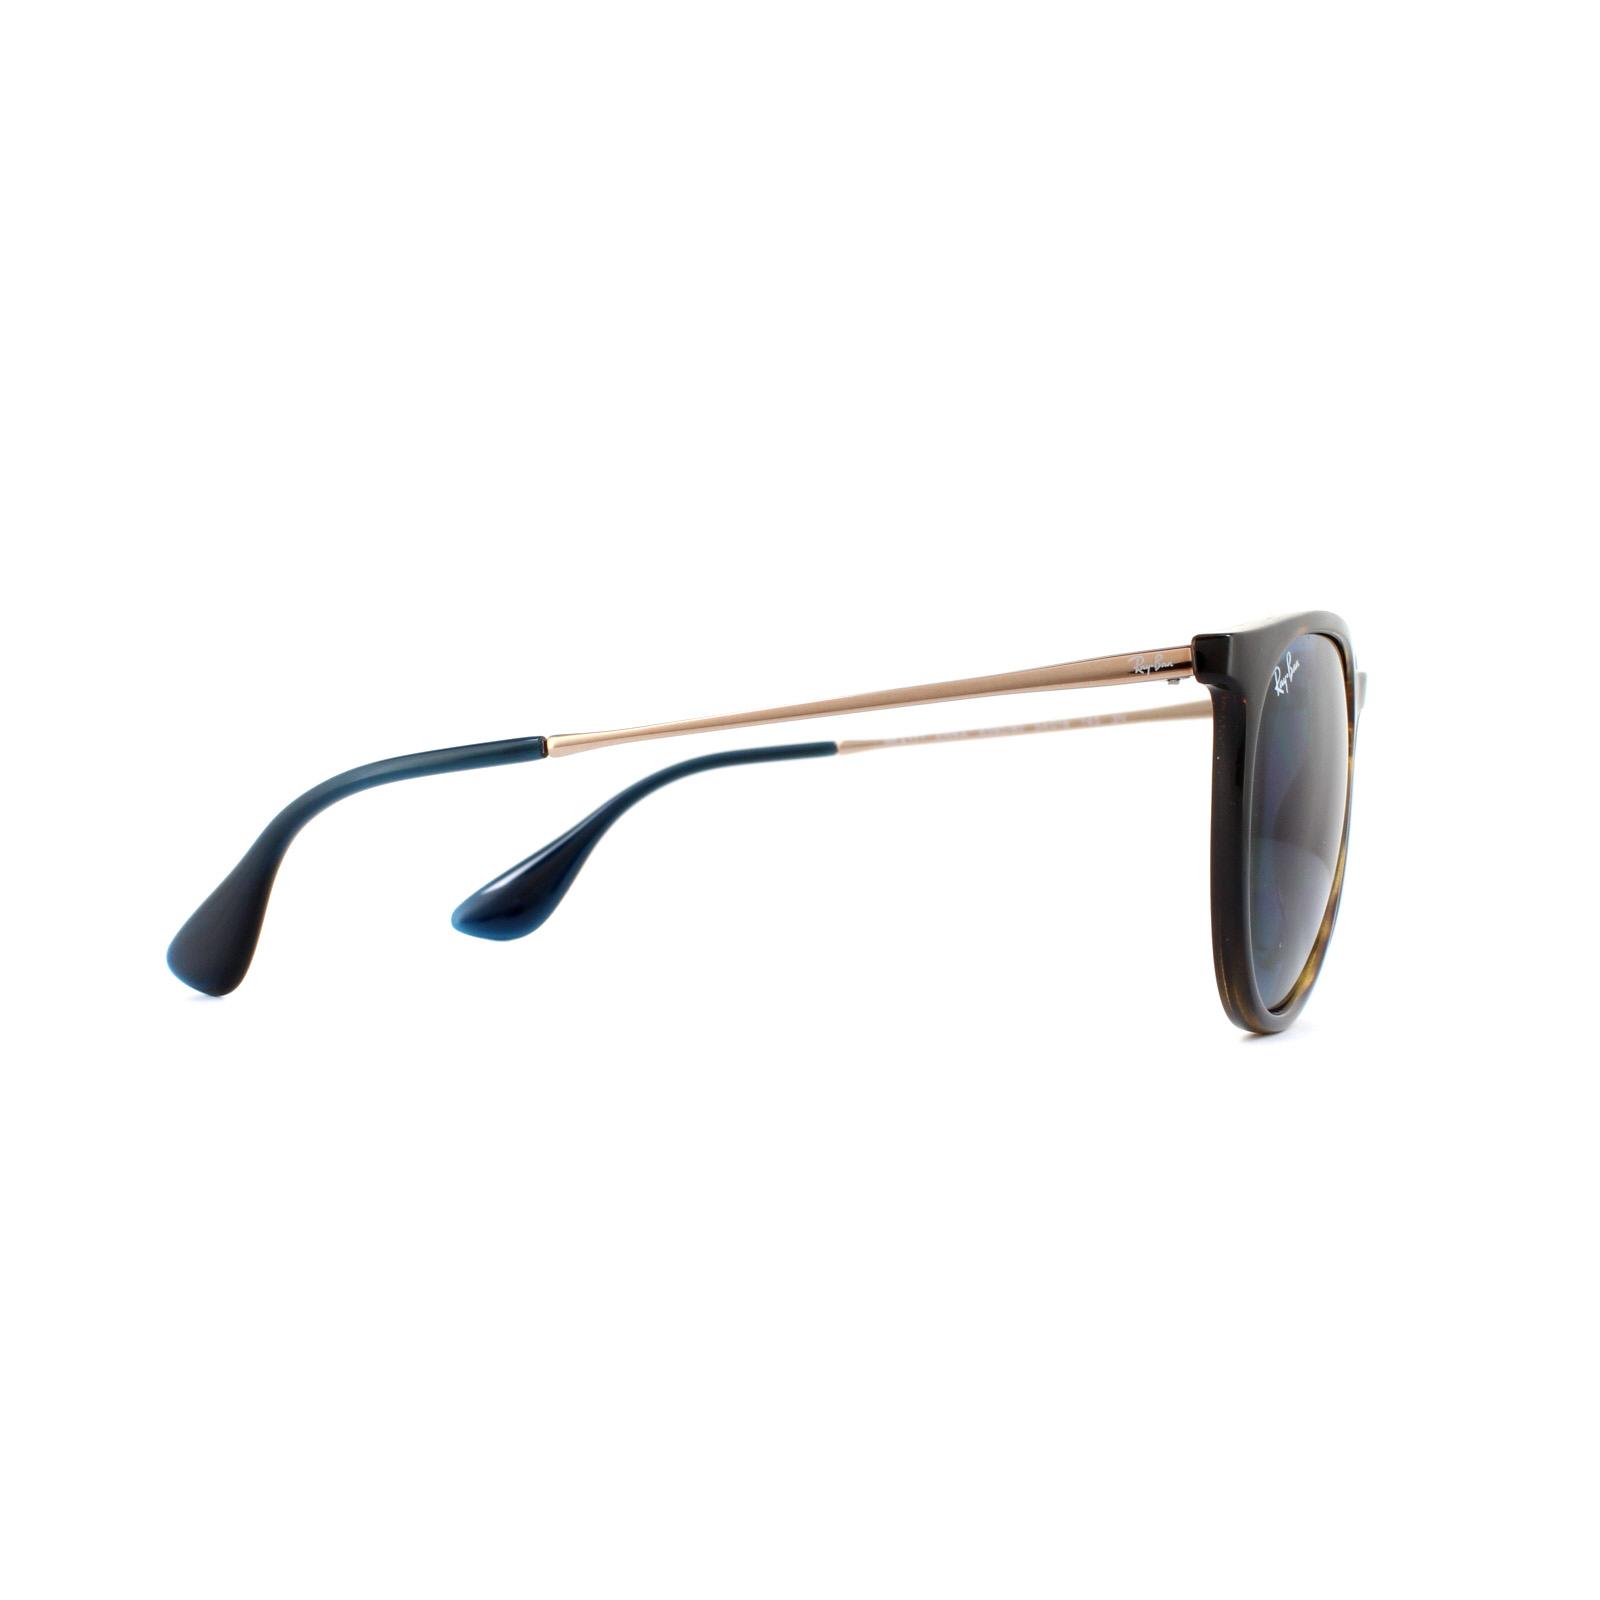 Cheap Ray-Ban Erika 4171 Sunglasses - Discounted Sunglasses 90585afc19